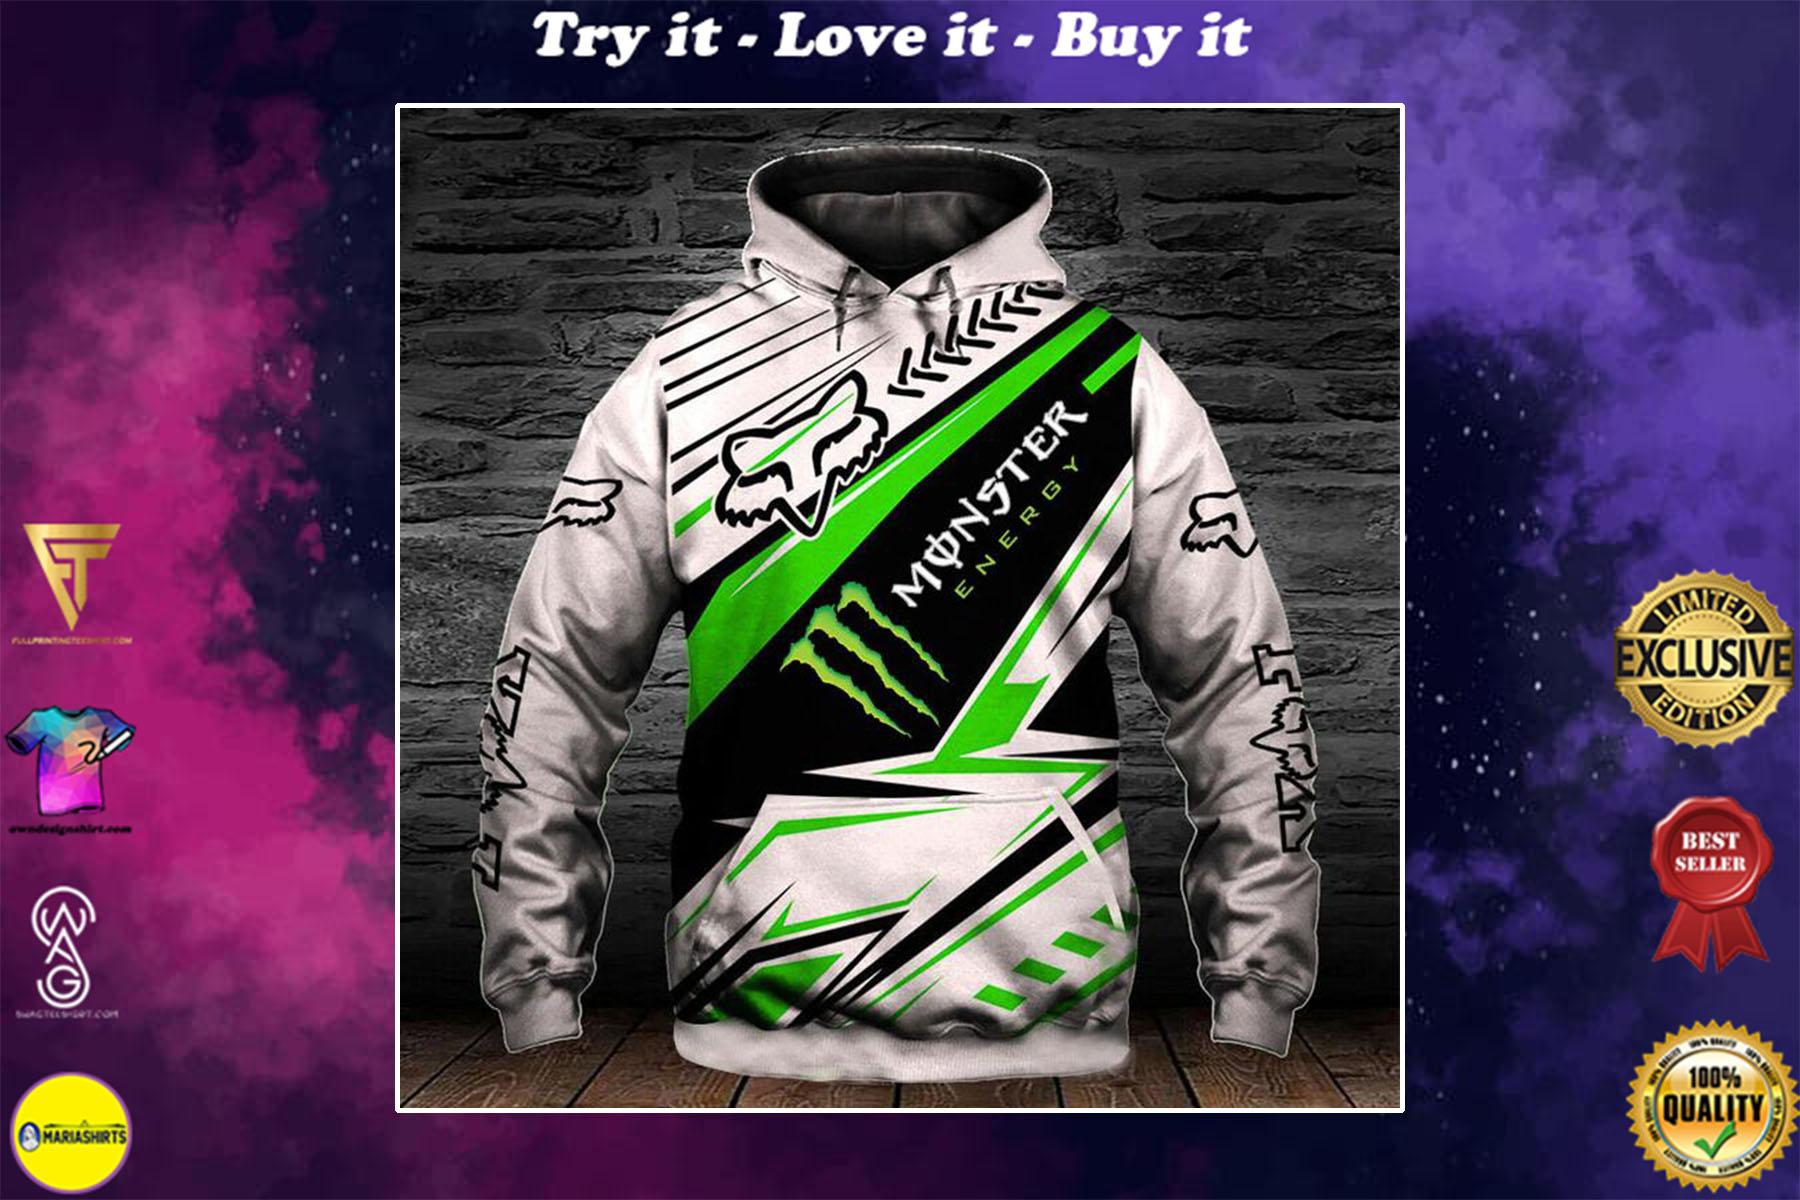 [special edition] monster energy fox racing motocross supercross full printing shirt - maria